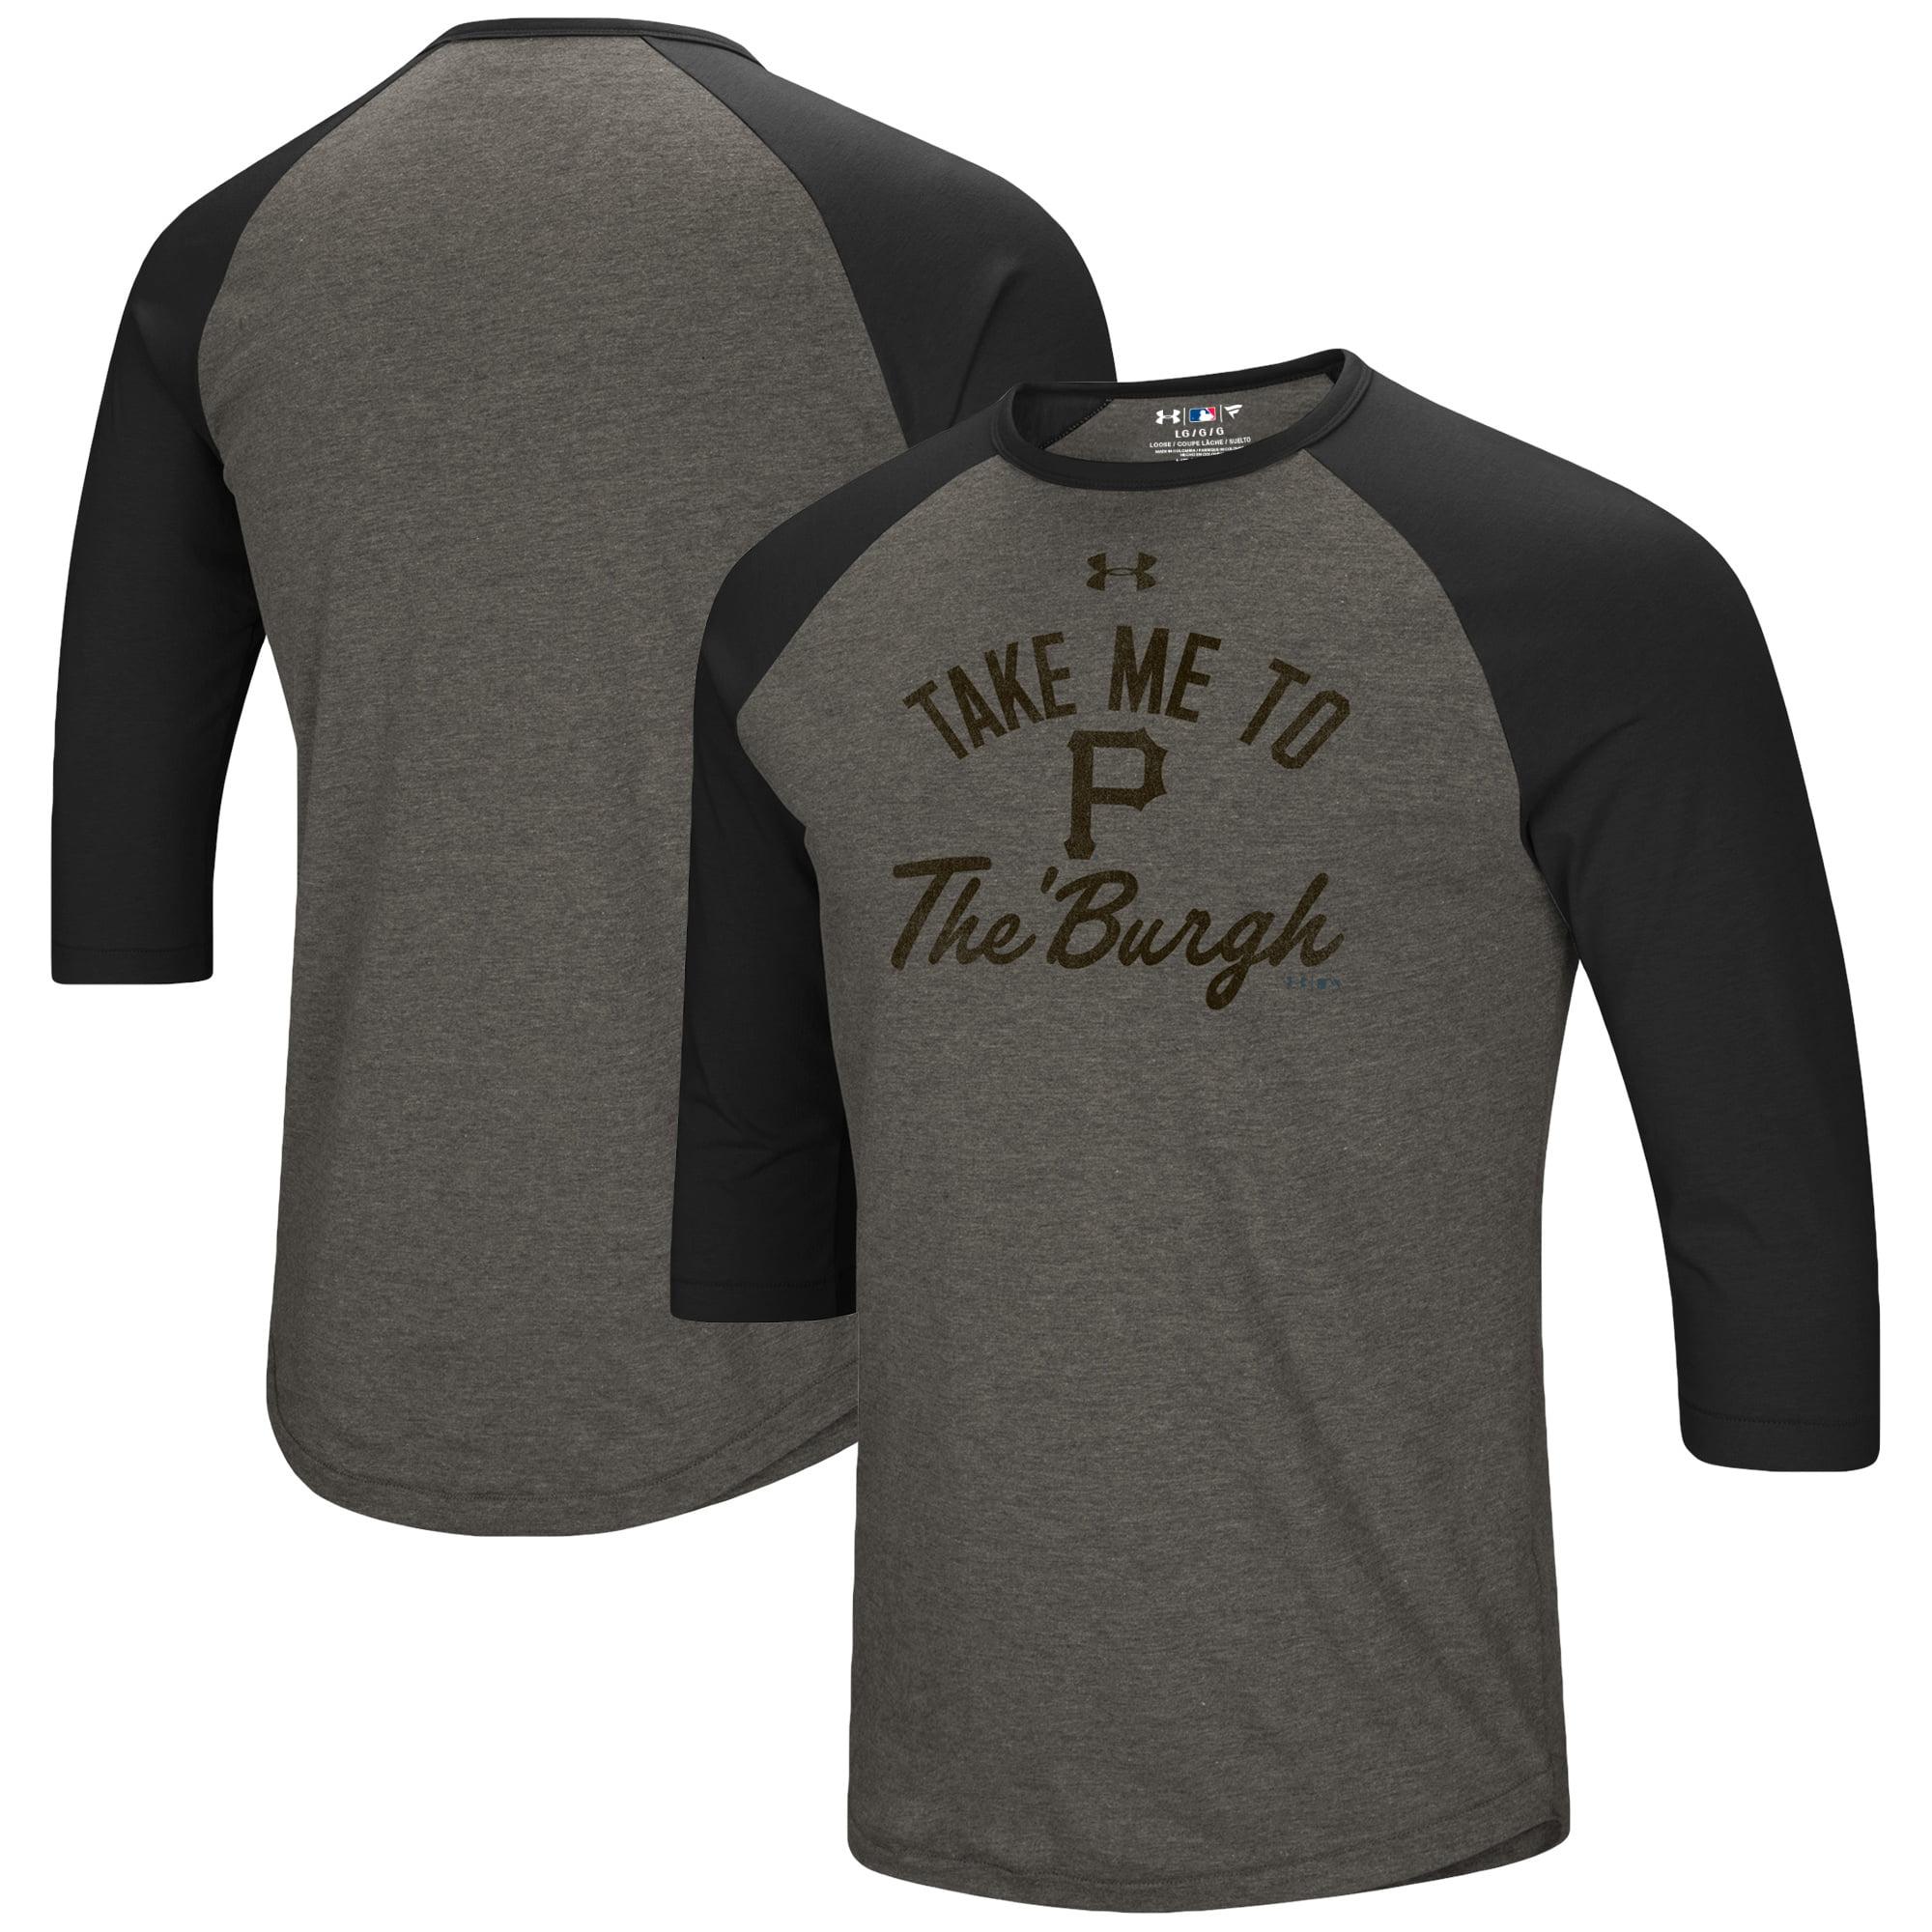 Pittsburgh Pirates Under Armour Heritage Performance Tri-Blend Raglan 3/4-Sleeve T-Shirt - Heathered Gray/Black